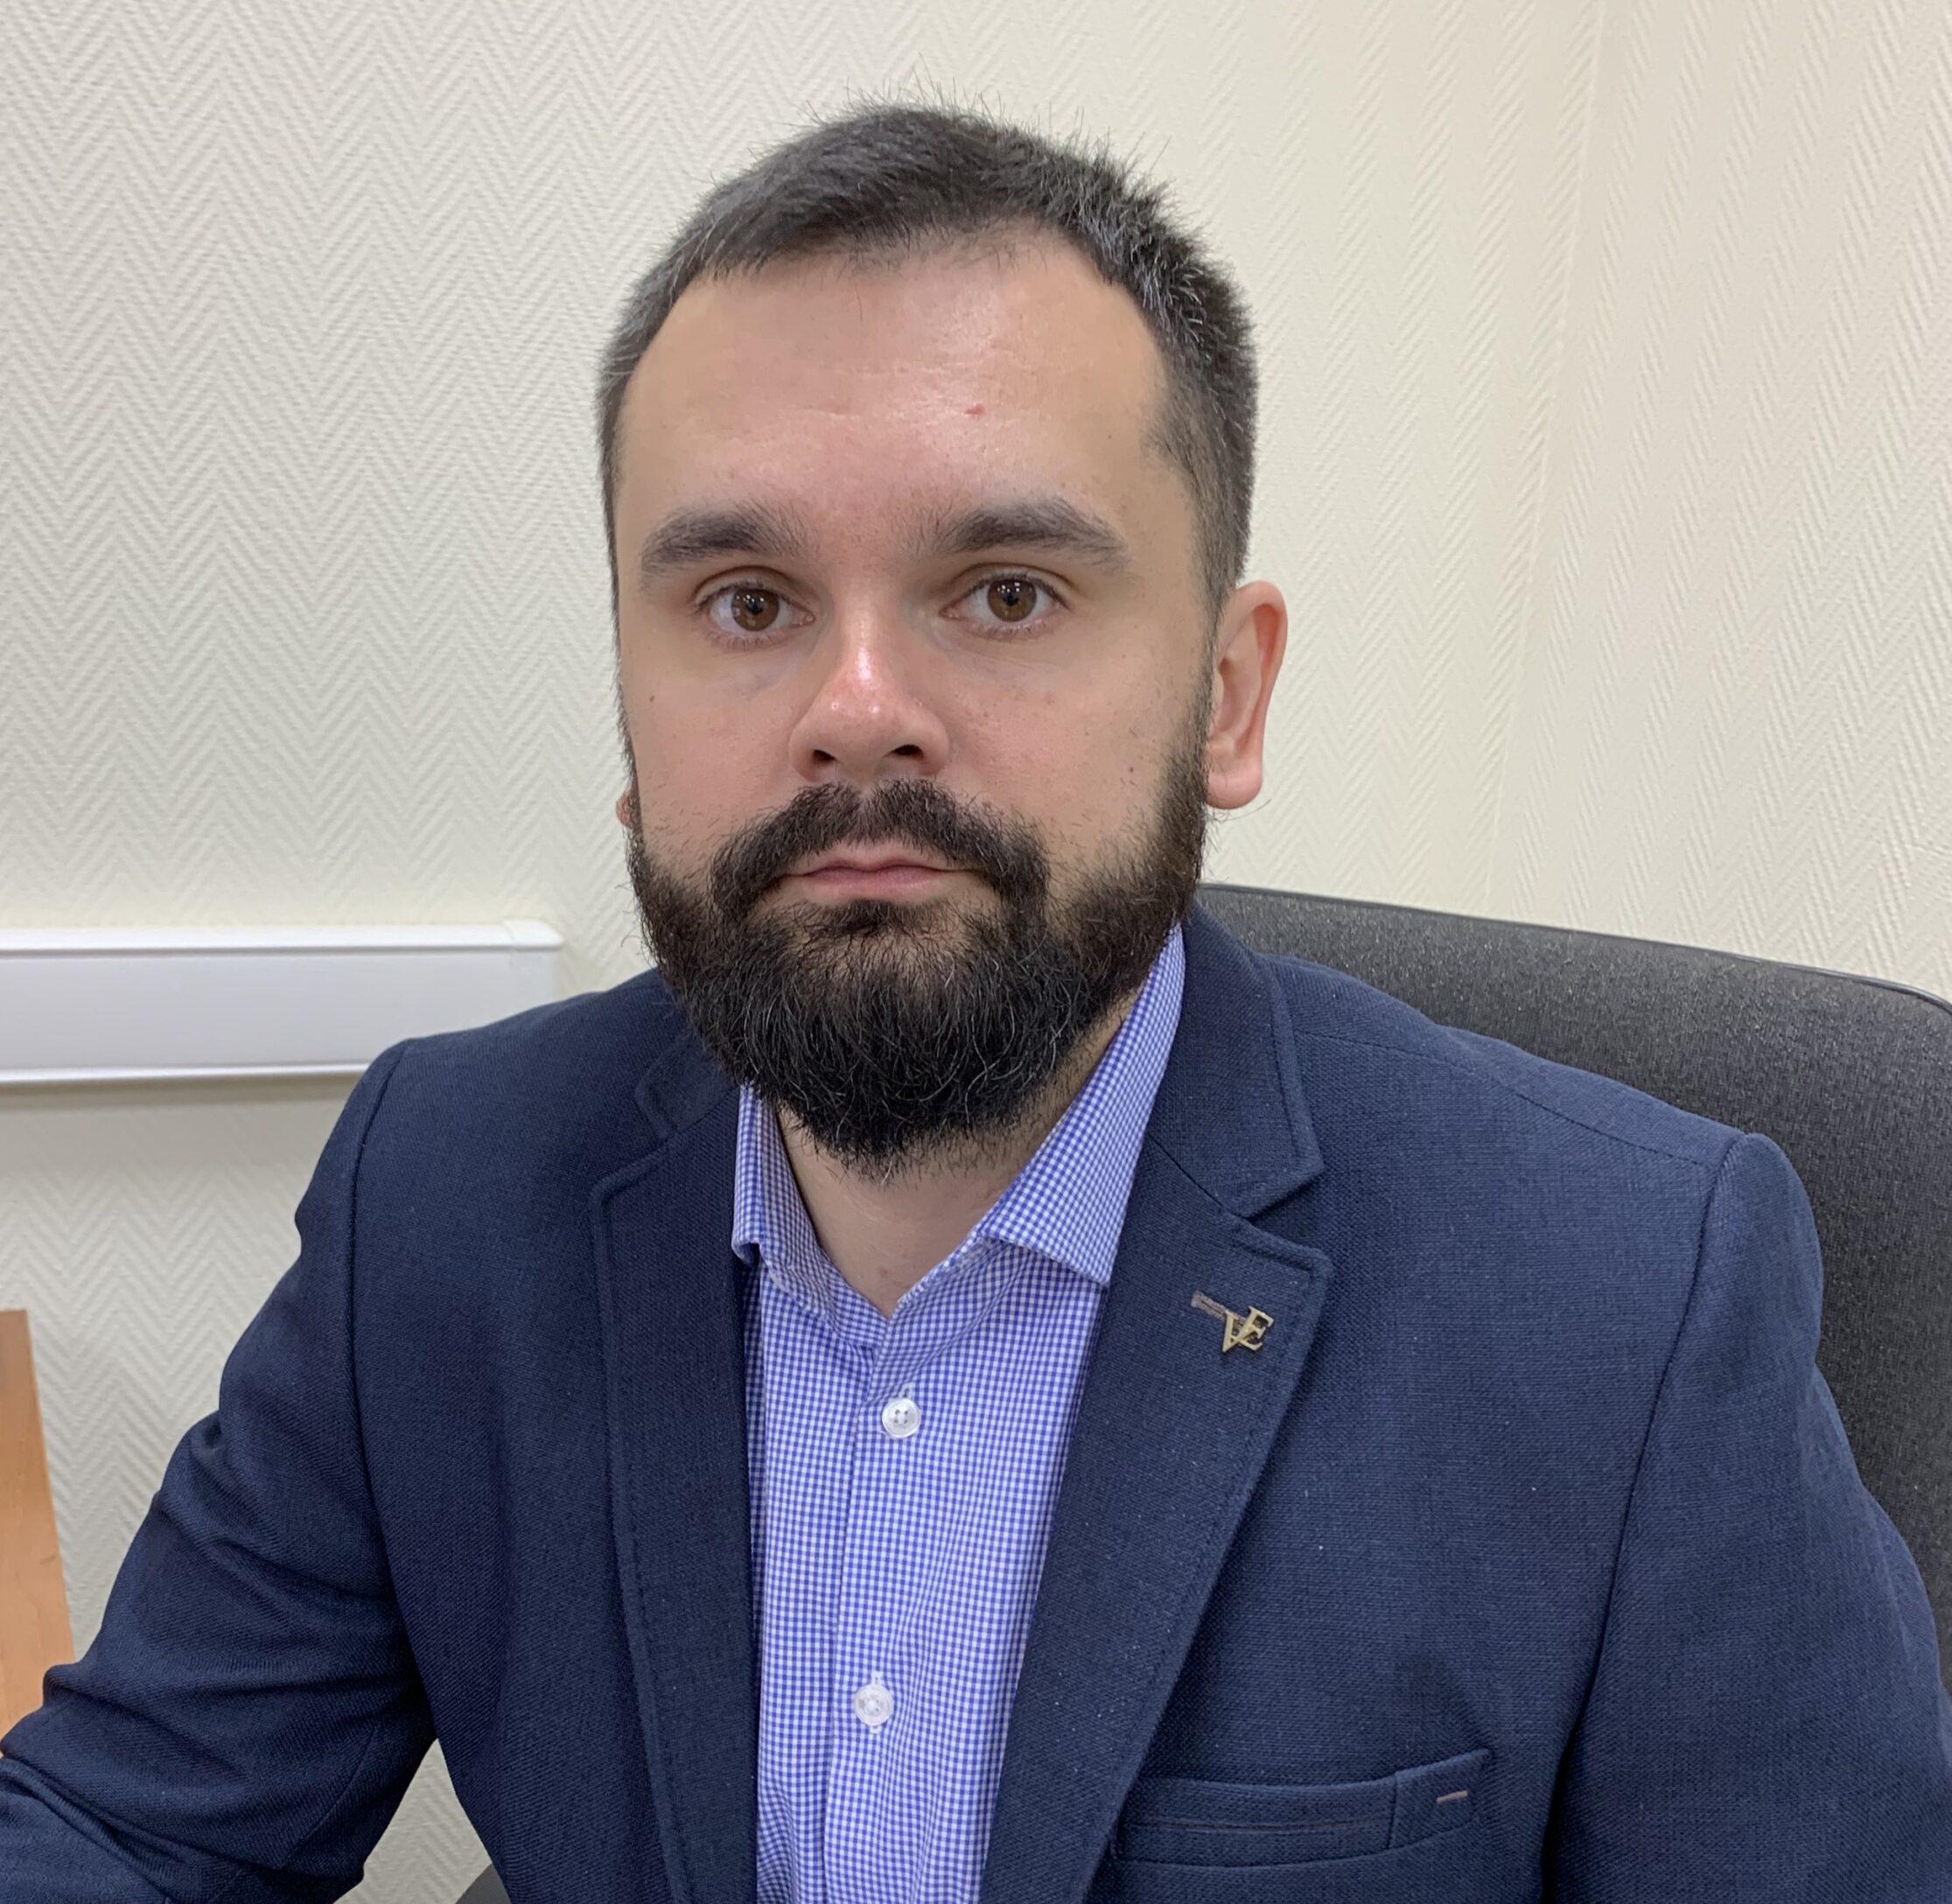 емарин Дмитрий Владимирович